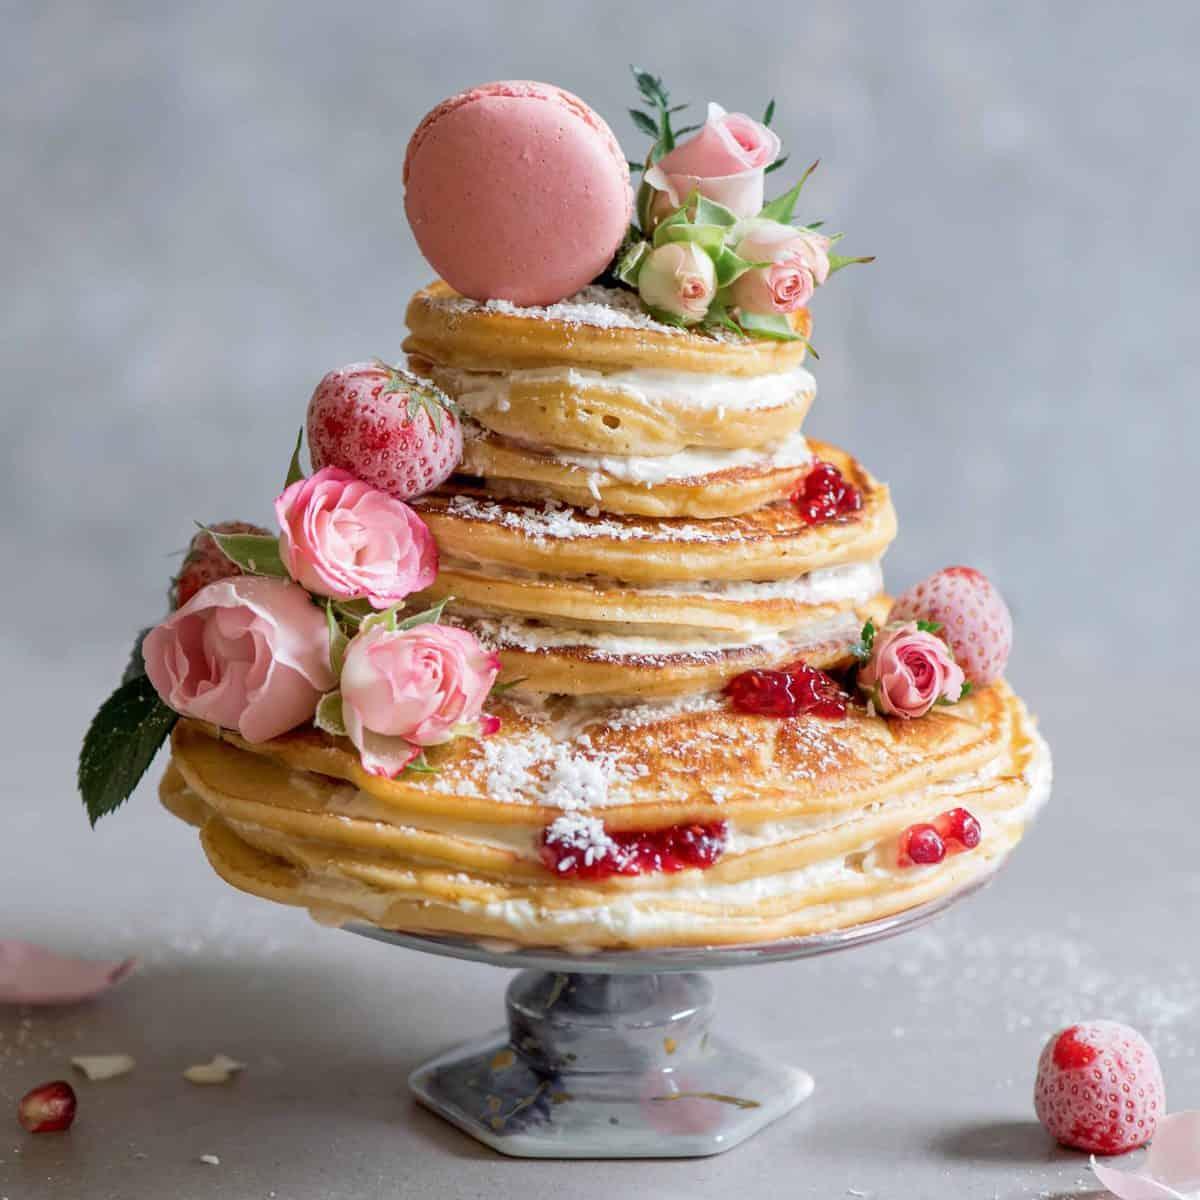 Pancake cake with roses, jam, coconut cream frosting, macaron